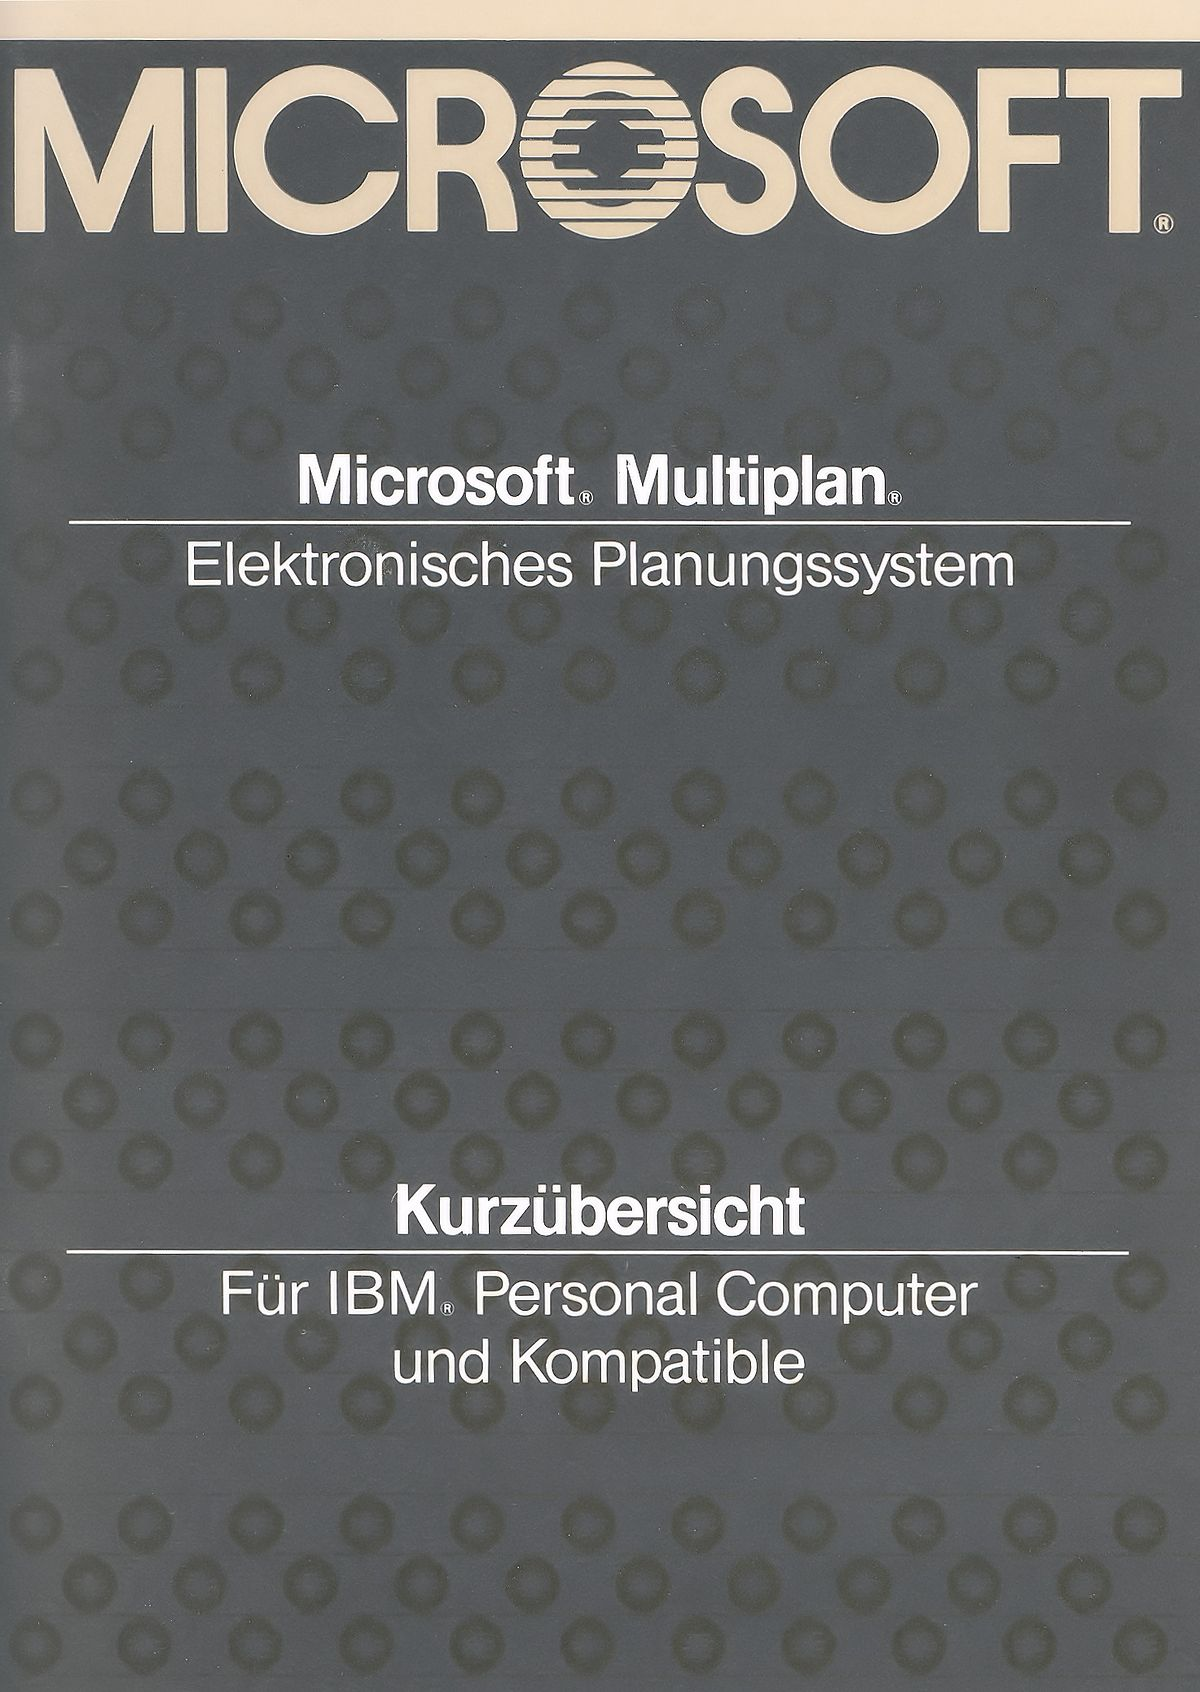 Microsoft Multiplan Wikipedia